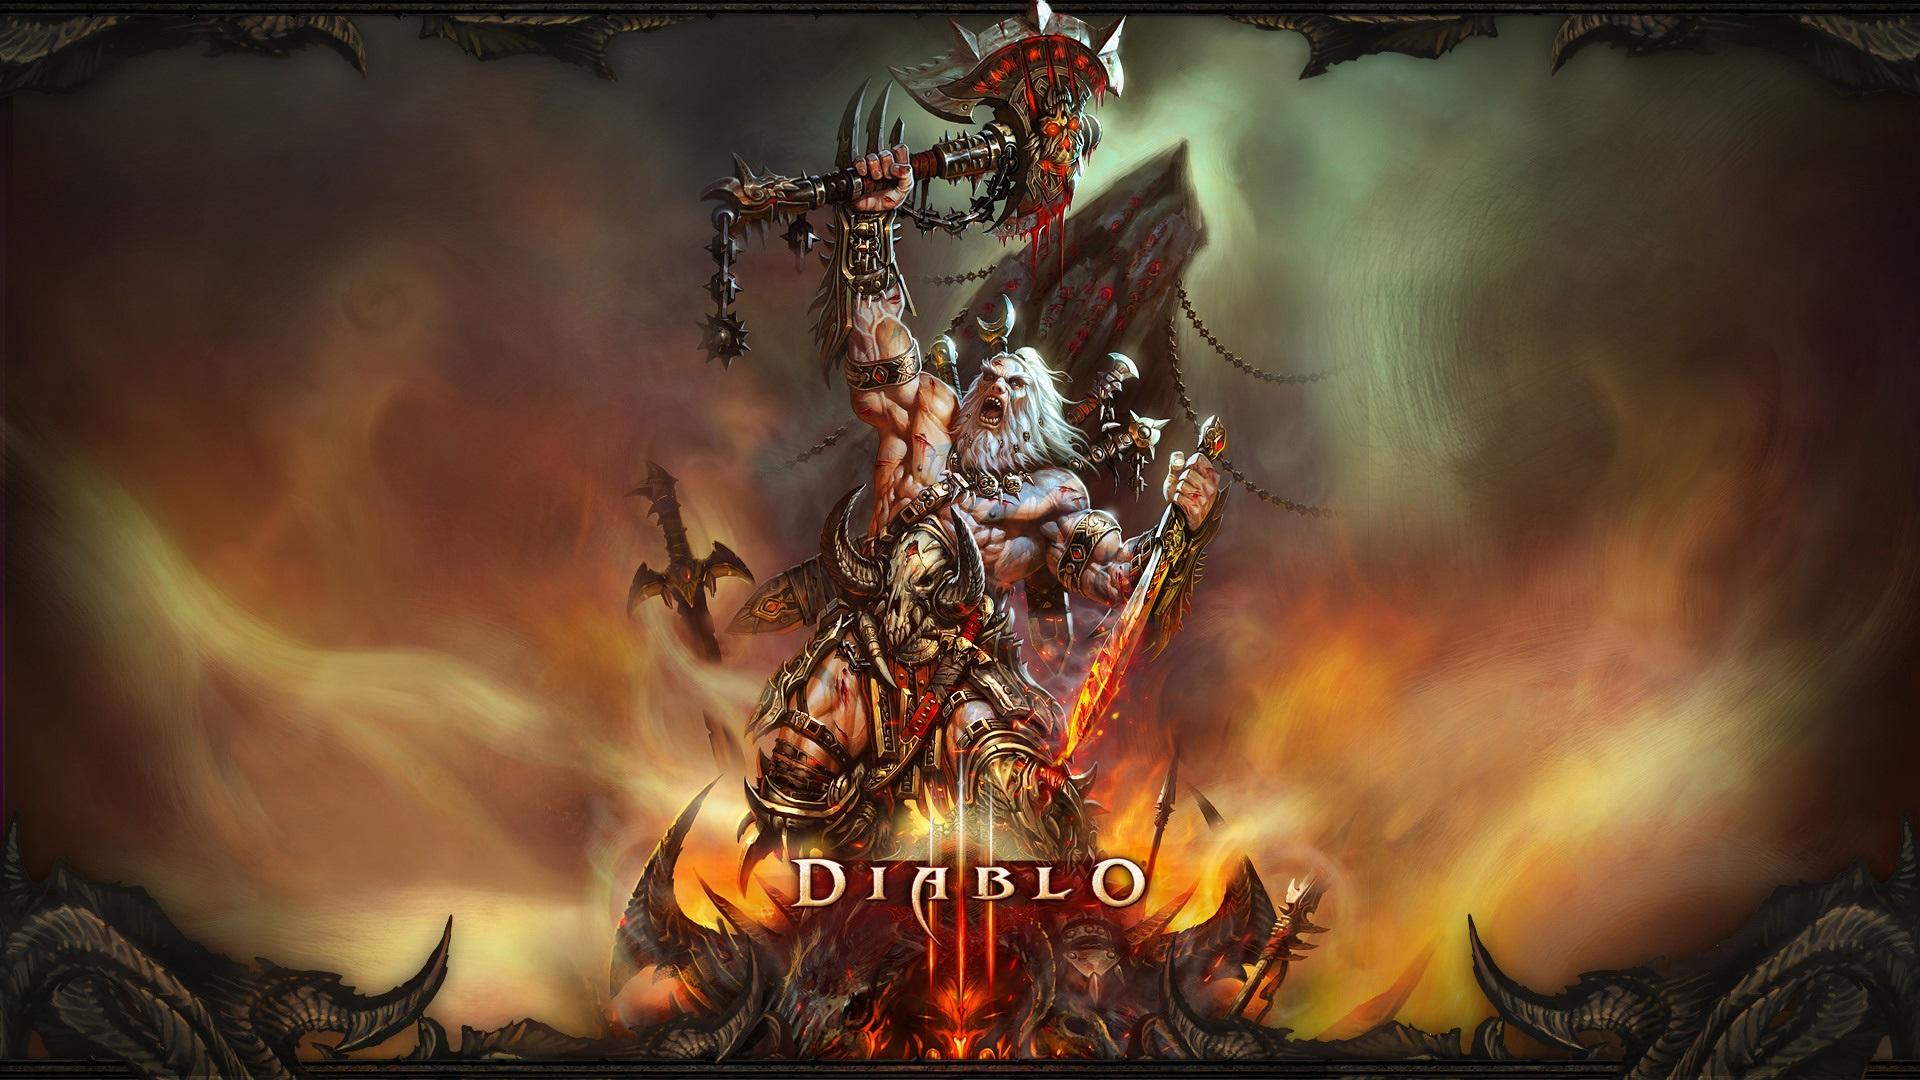 Diablo 3 Wallpaper 1920x1080: Wallpaper Diablo 3, Barbarian 1920x1080 Full HD 2K Picture